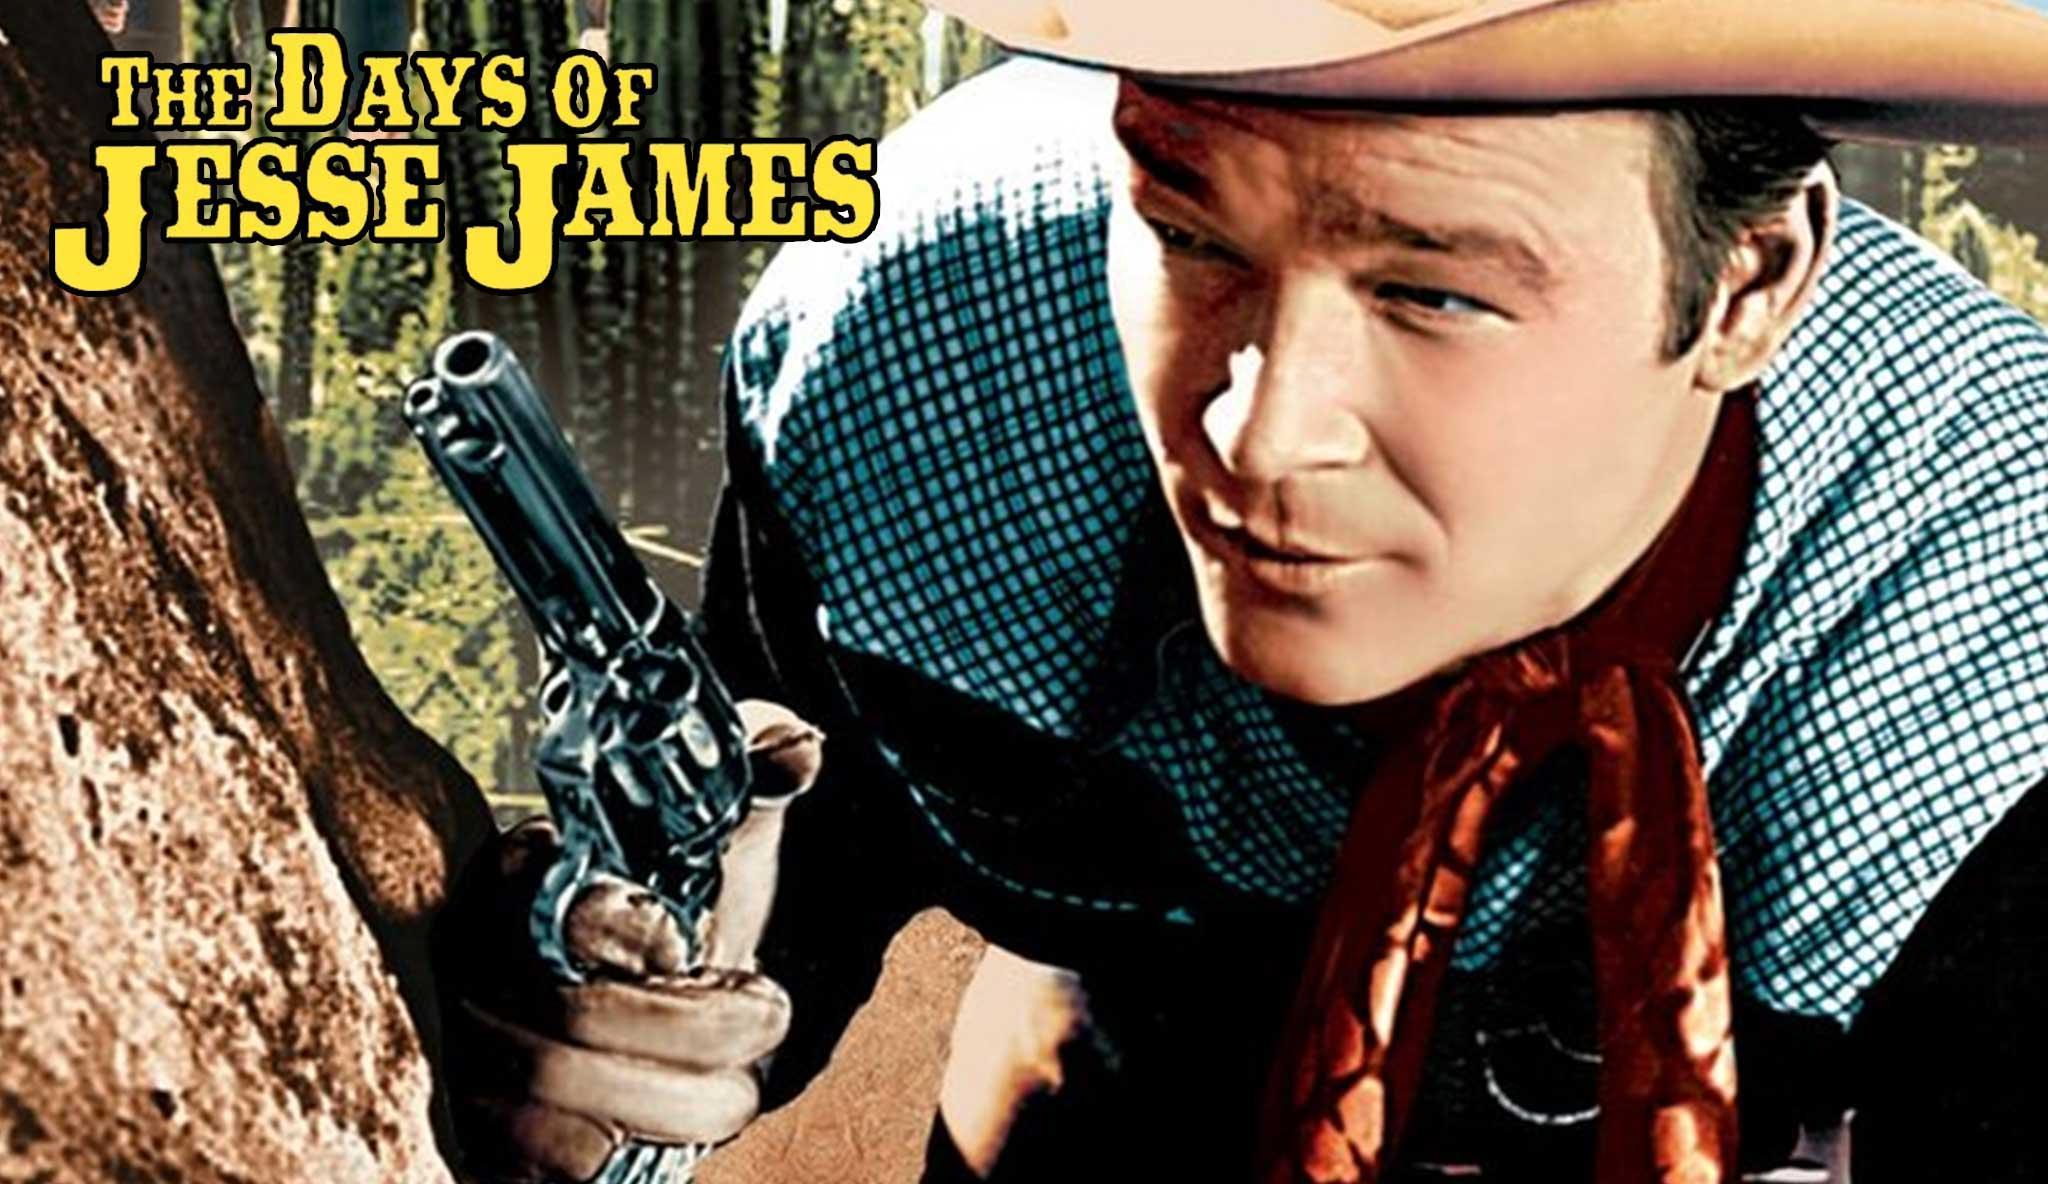 the-days-of-jesse-james\header.jpg